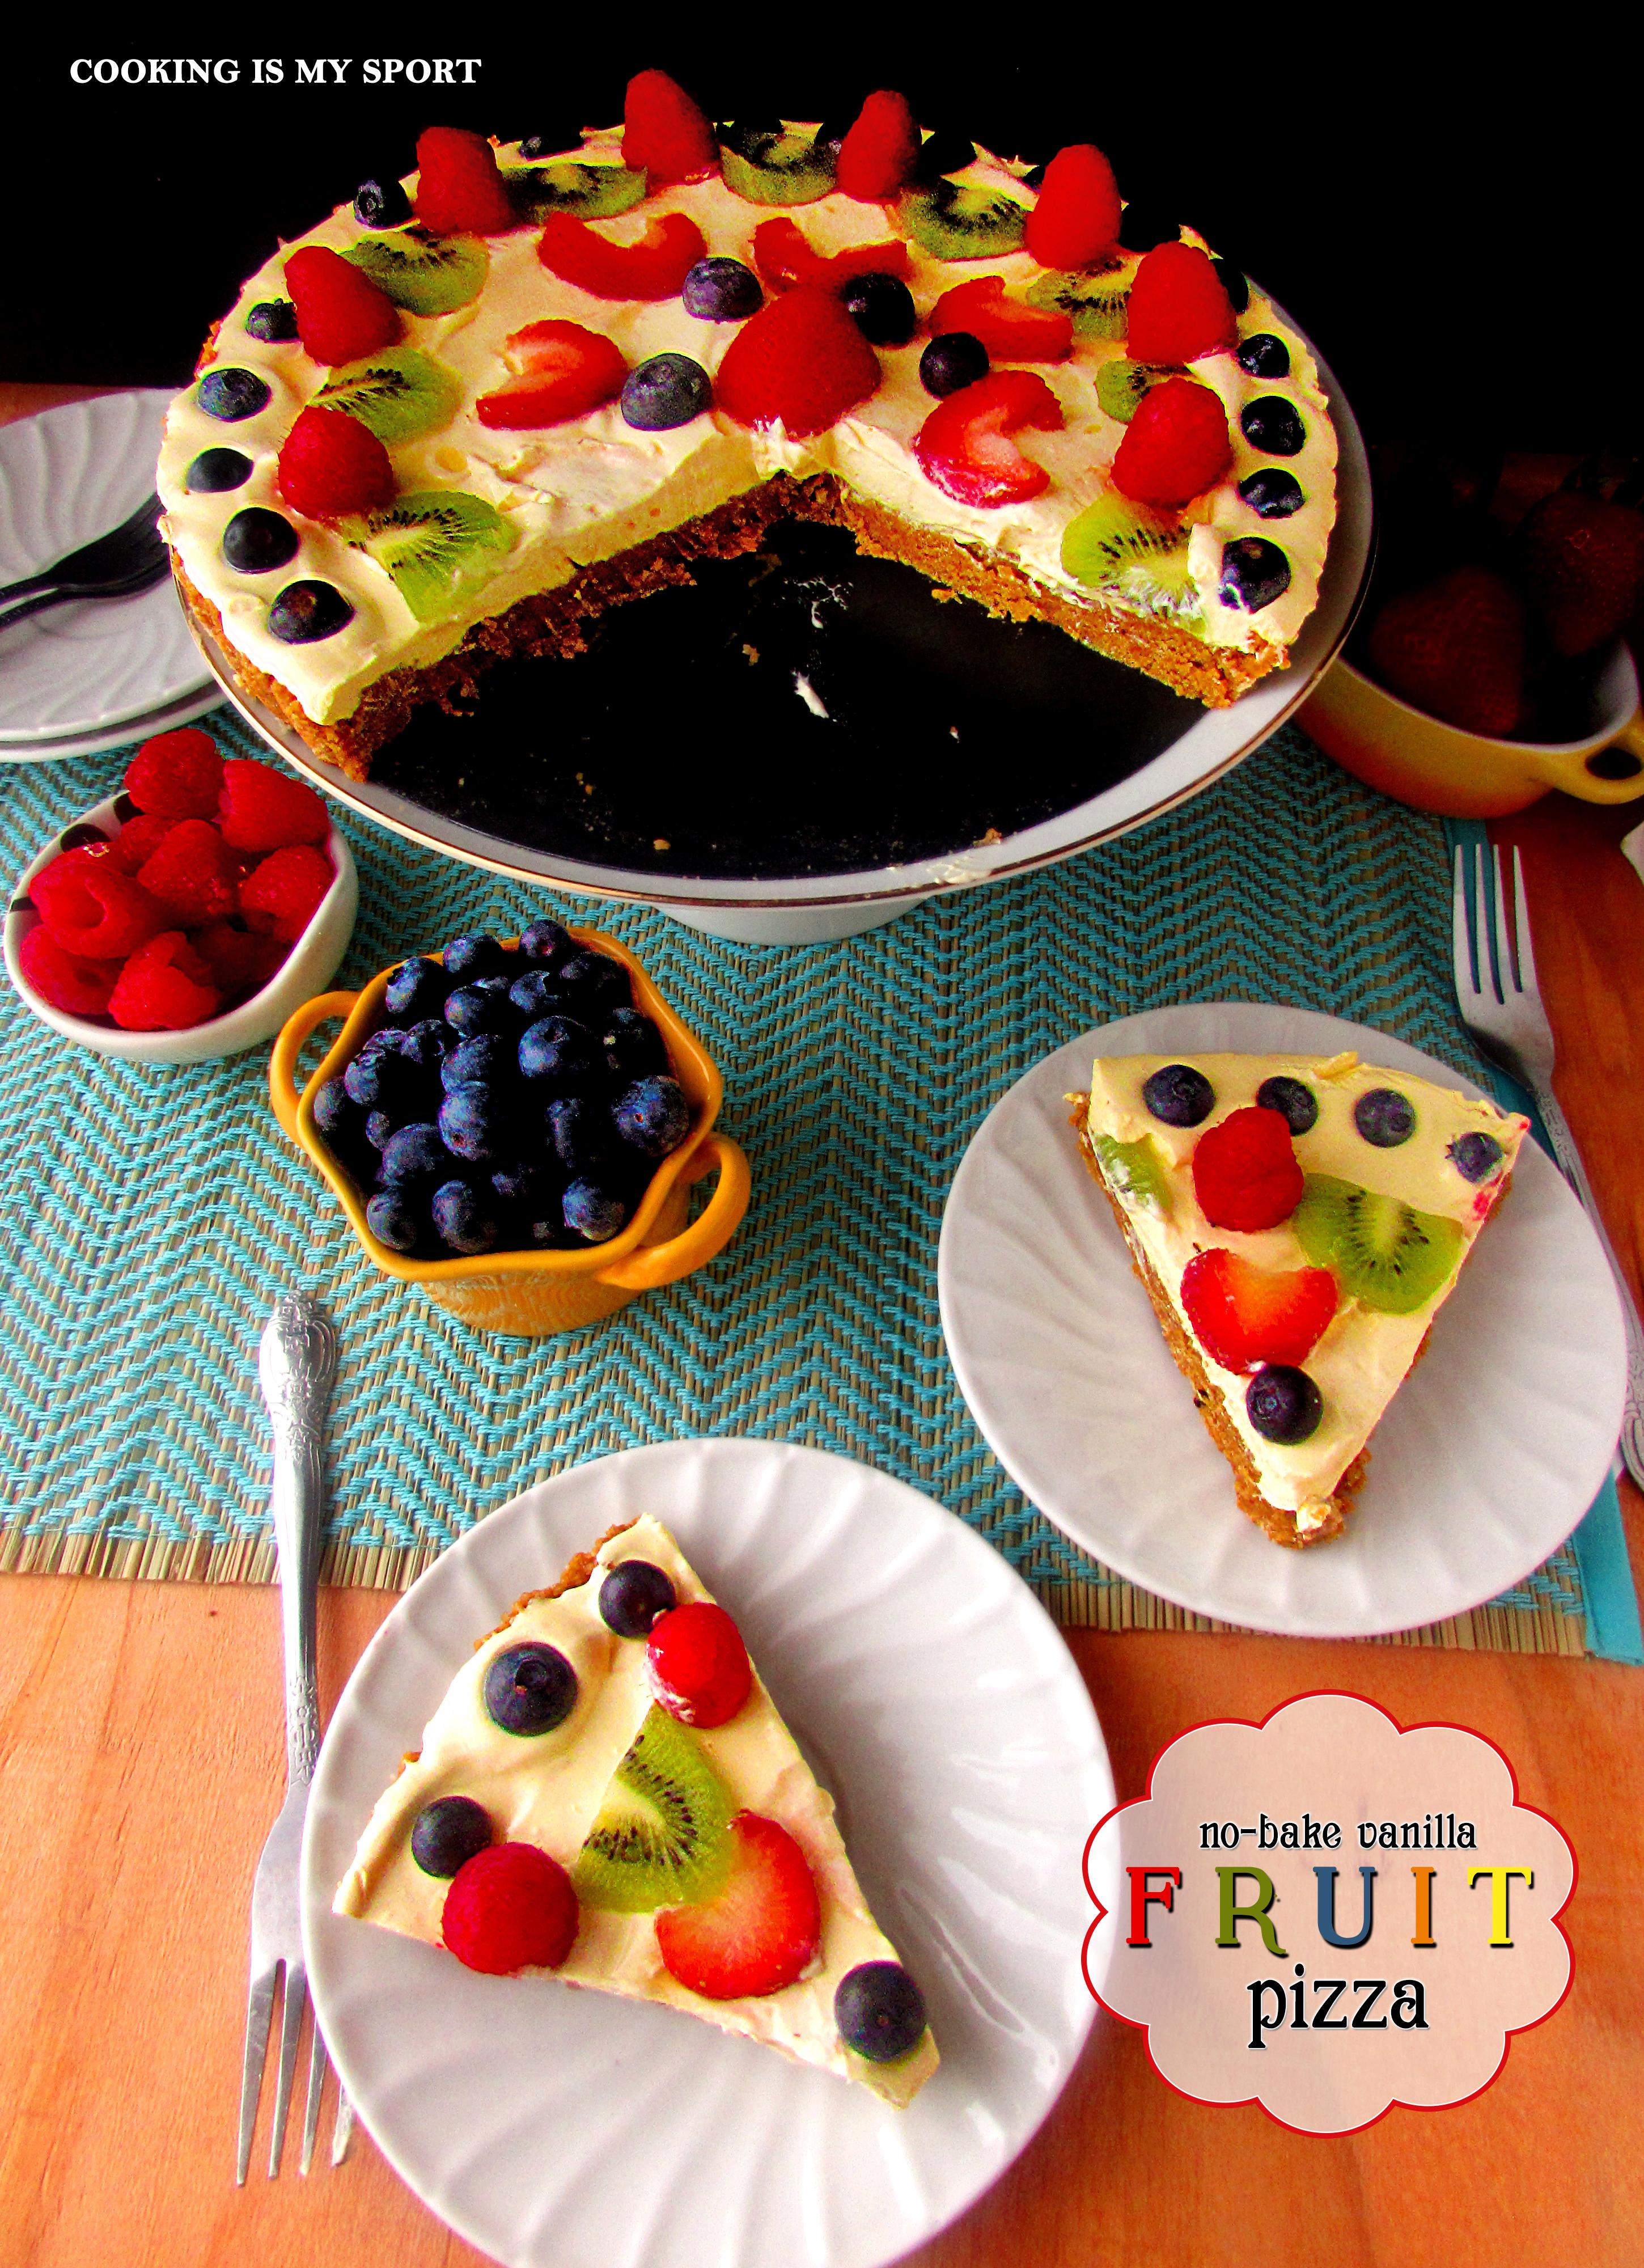 No Bake Vanilla Fruit Pizza6